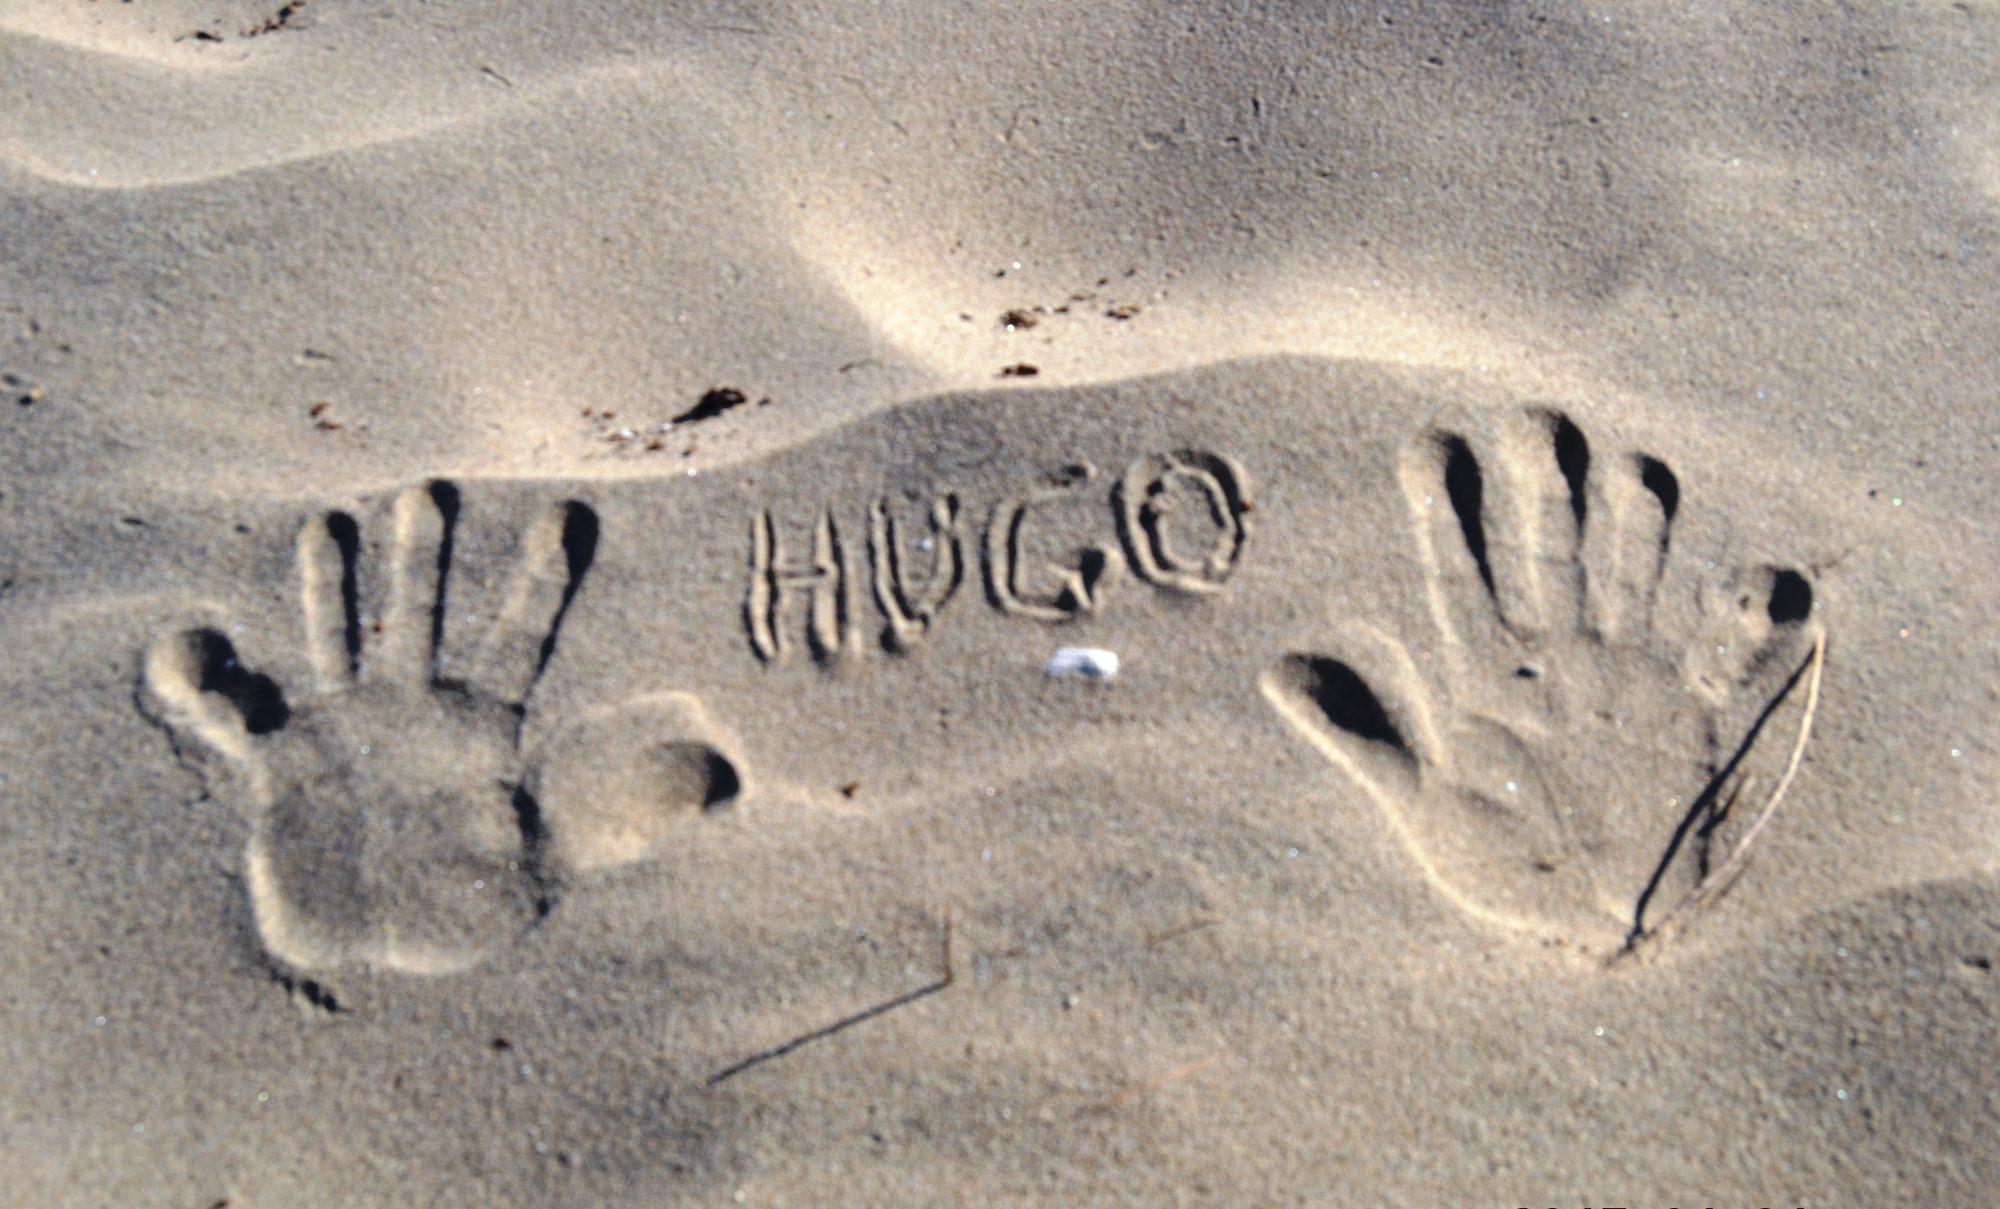 HUGO W. MERIDA